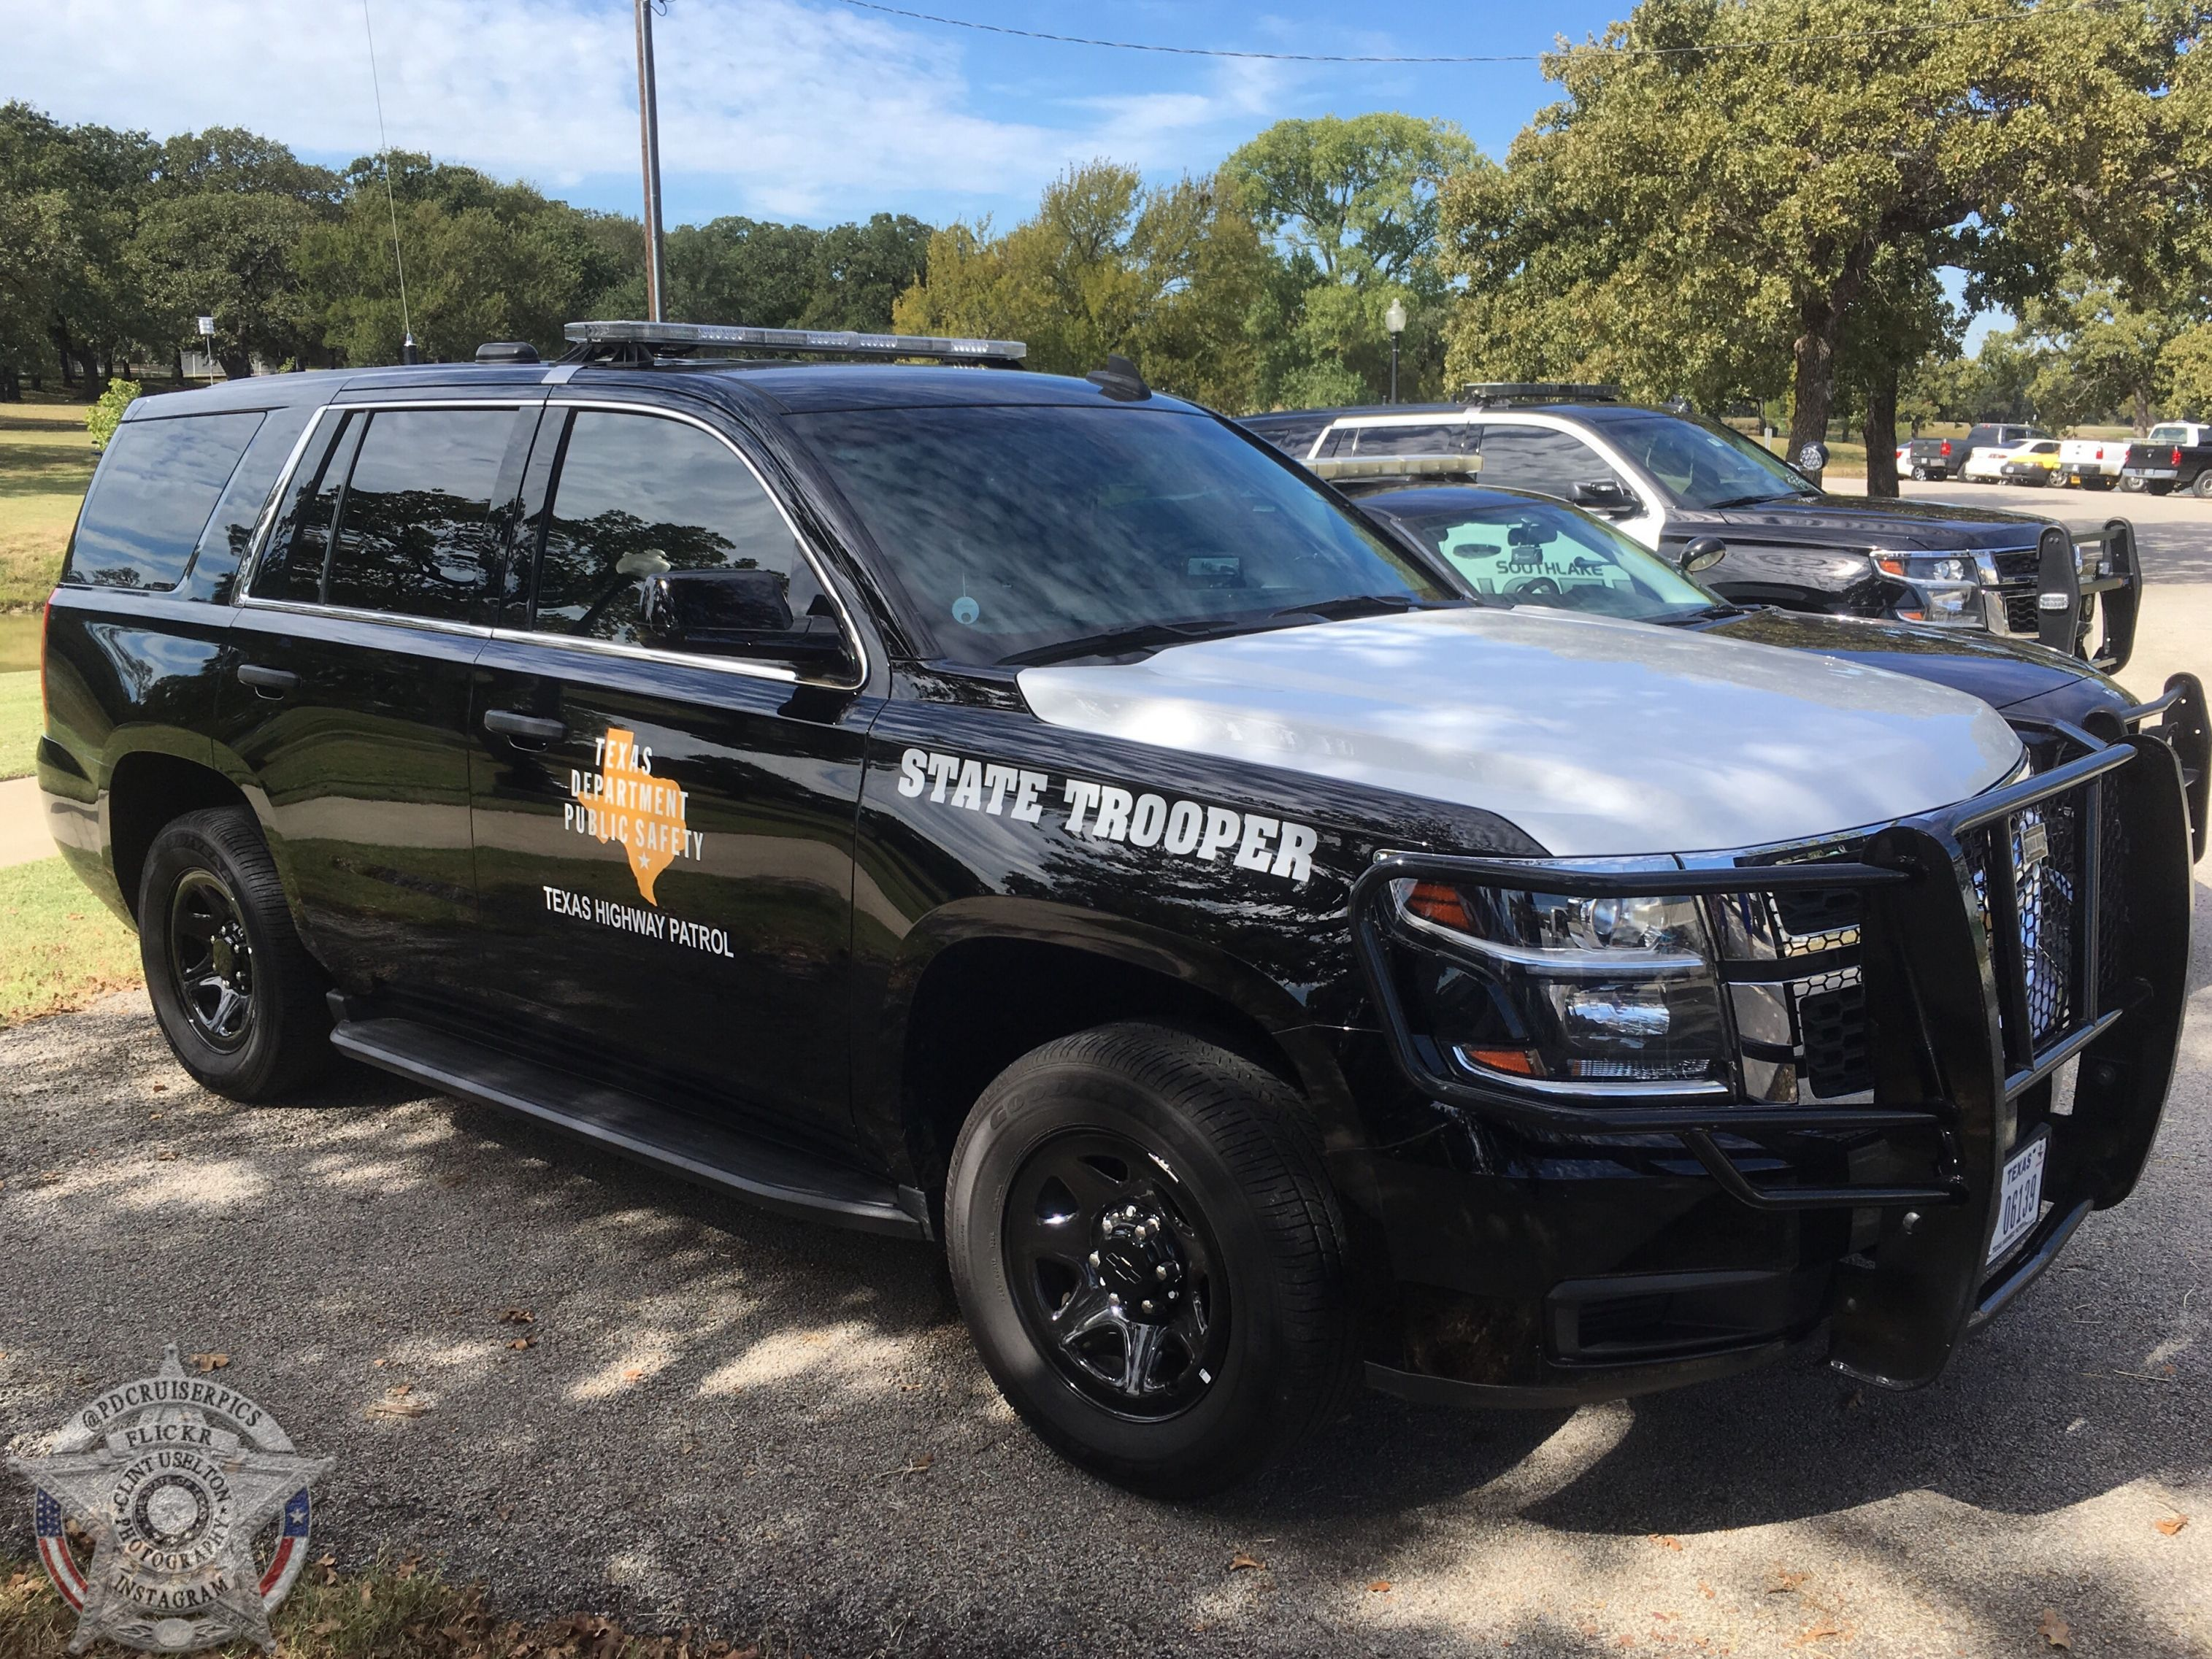 Texas Dps 2015 Chevy Tahoe Texas State Trooper 2015 Chevy Tahoe California Highway Patrol